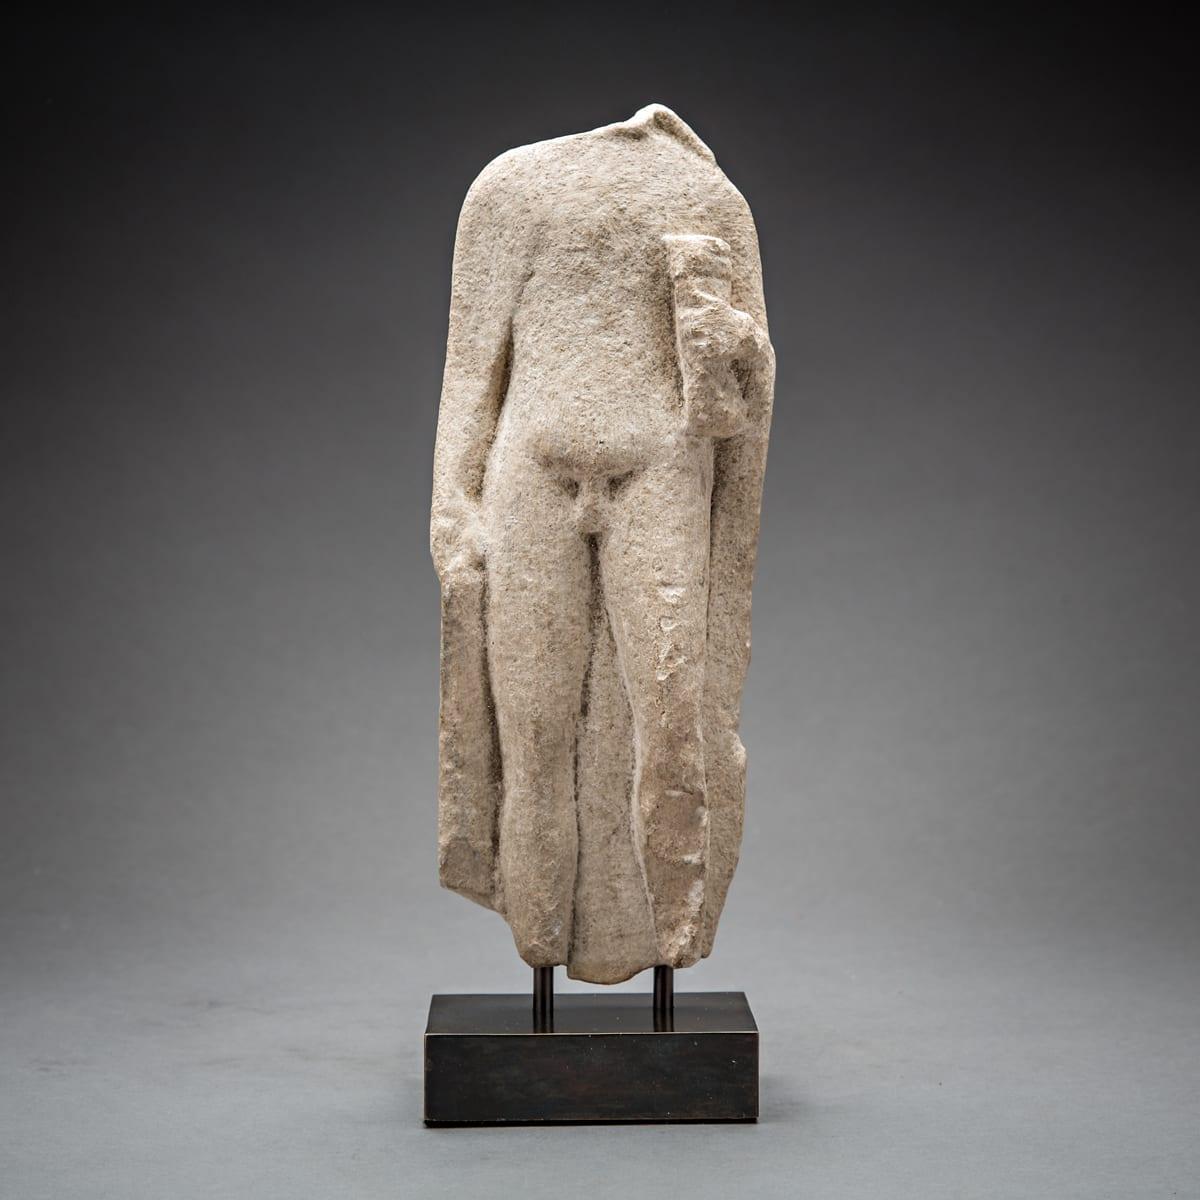 Hellenistic Torso, 300 BCE - 100 BCE Limestone 27.8 x 10.5 cm 11 x 4 1/8 in